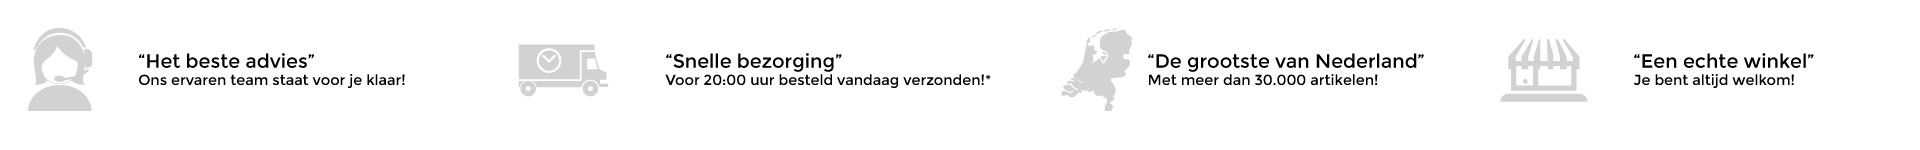 Textielstad.nl